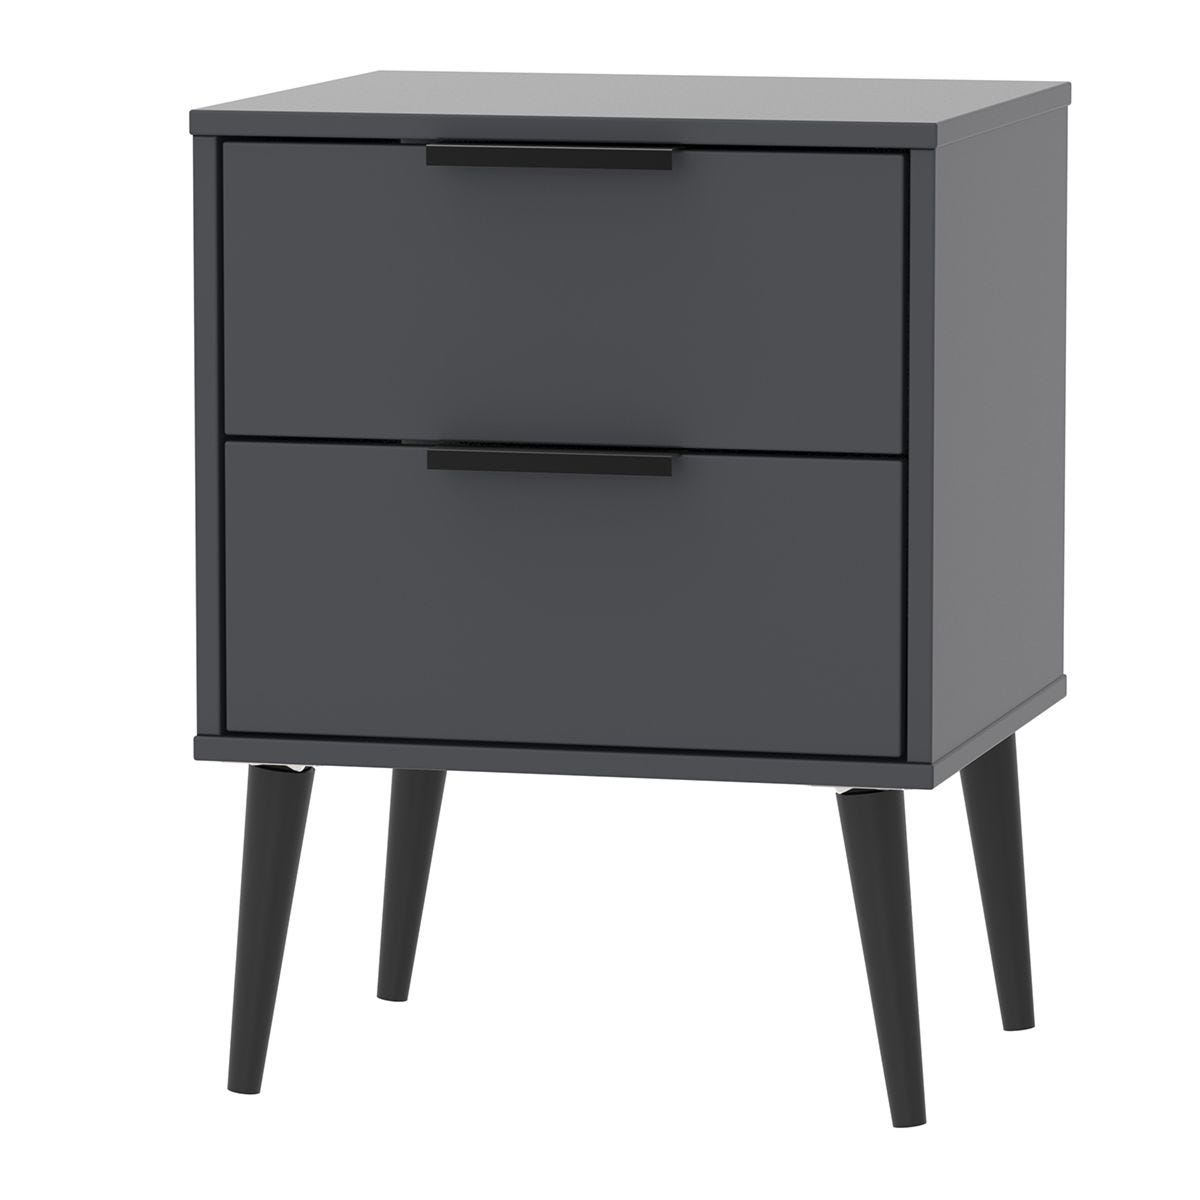 Hirato 2 Drawer Black Locker With Black Wooden Legs